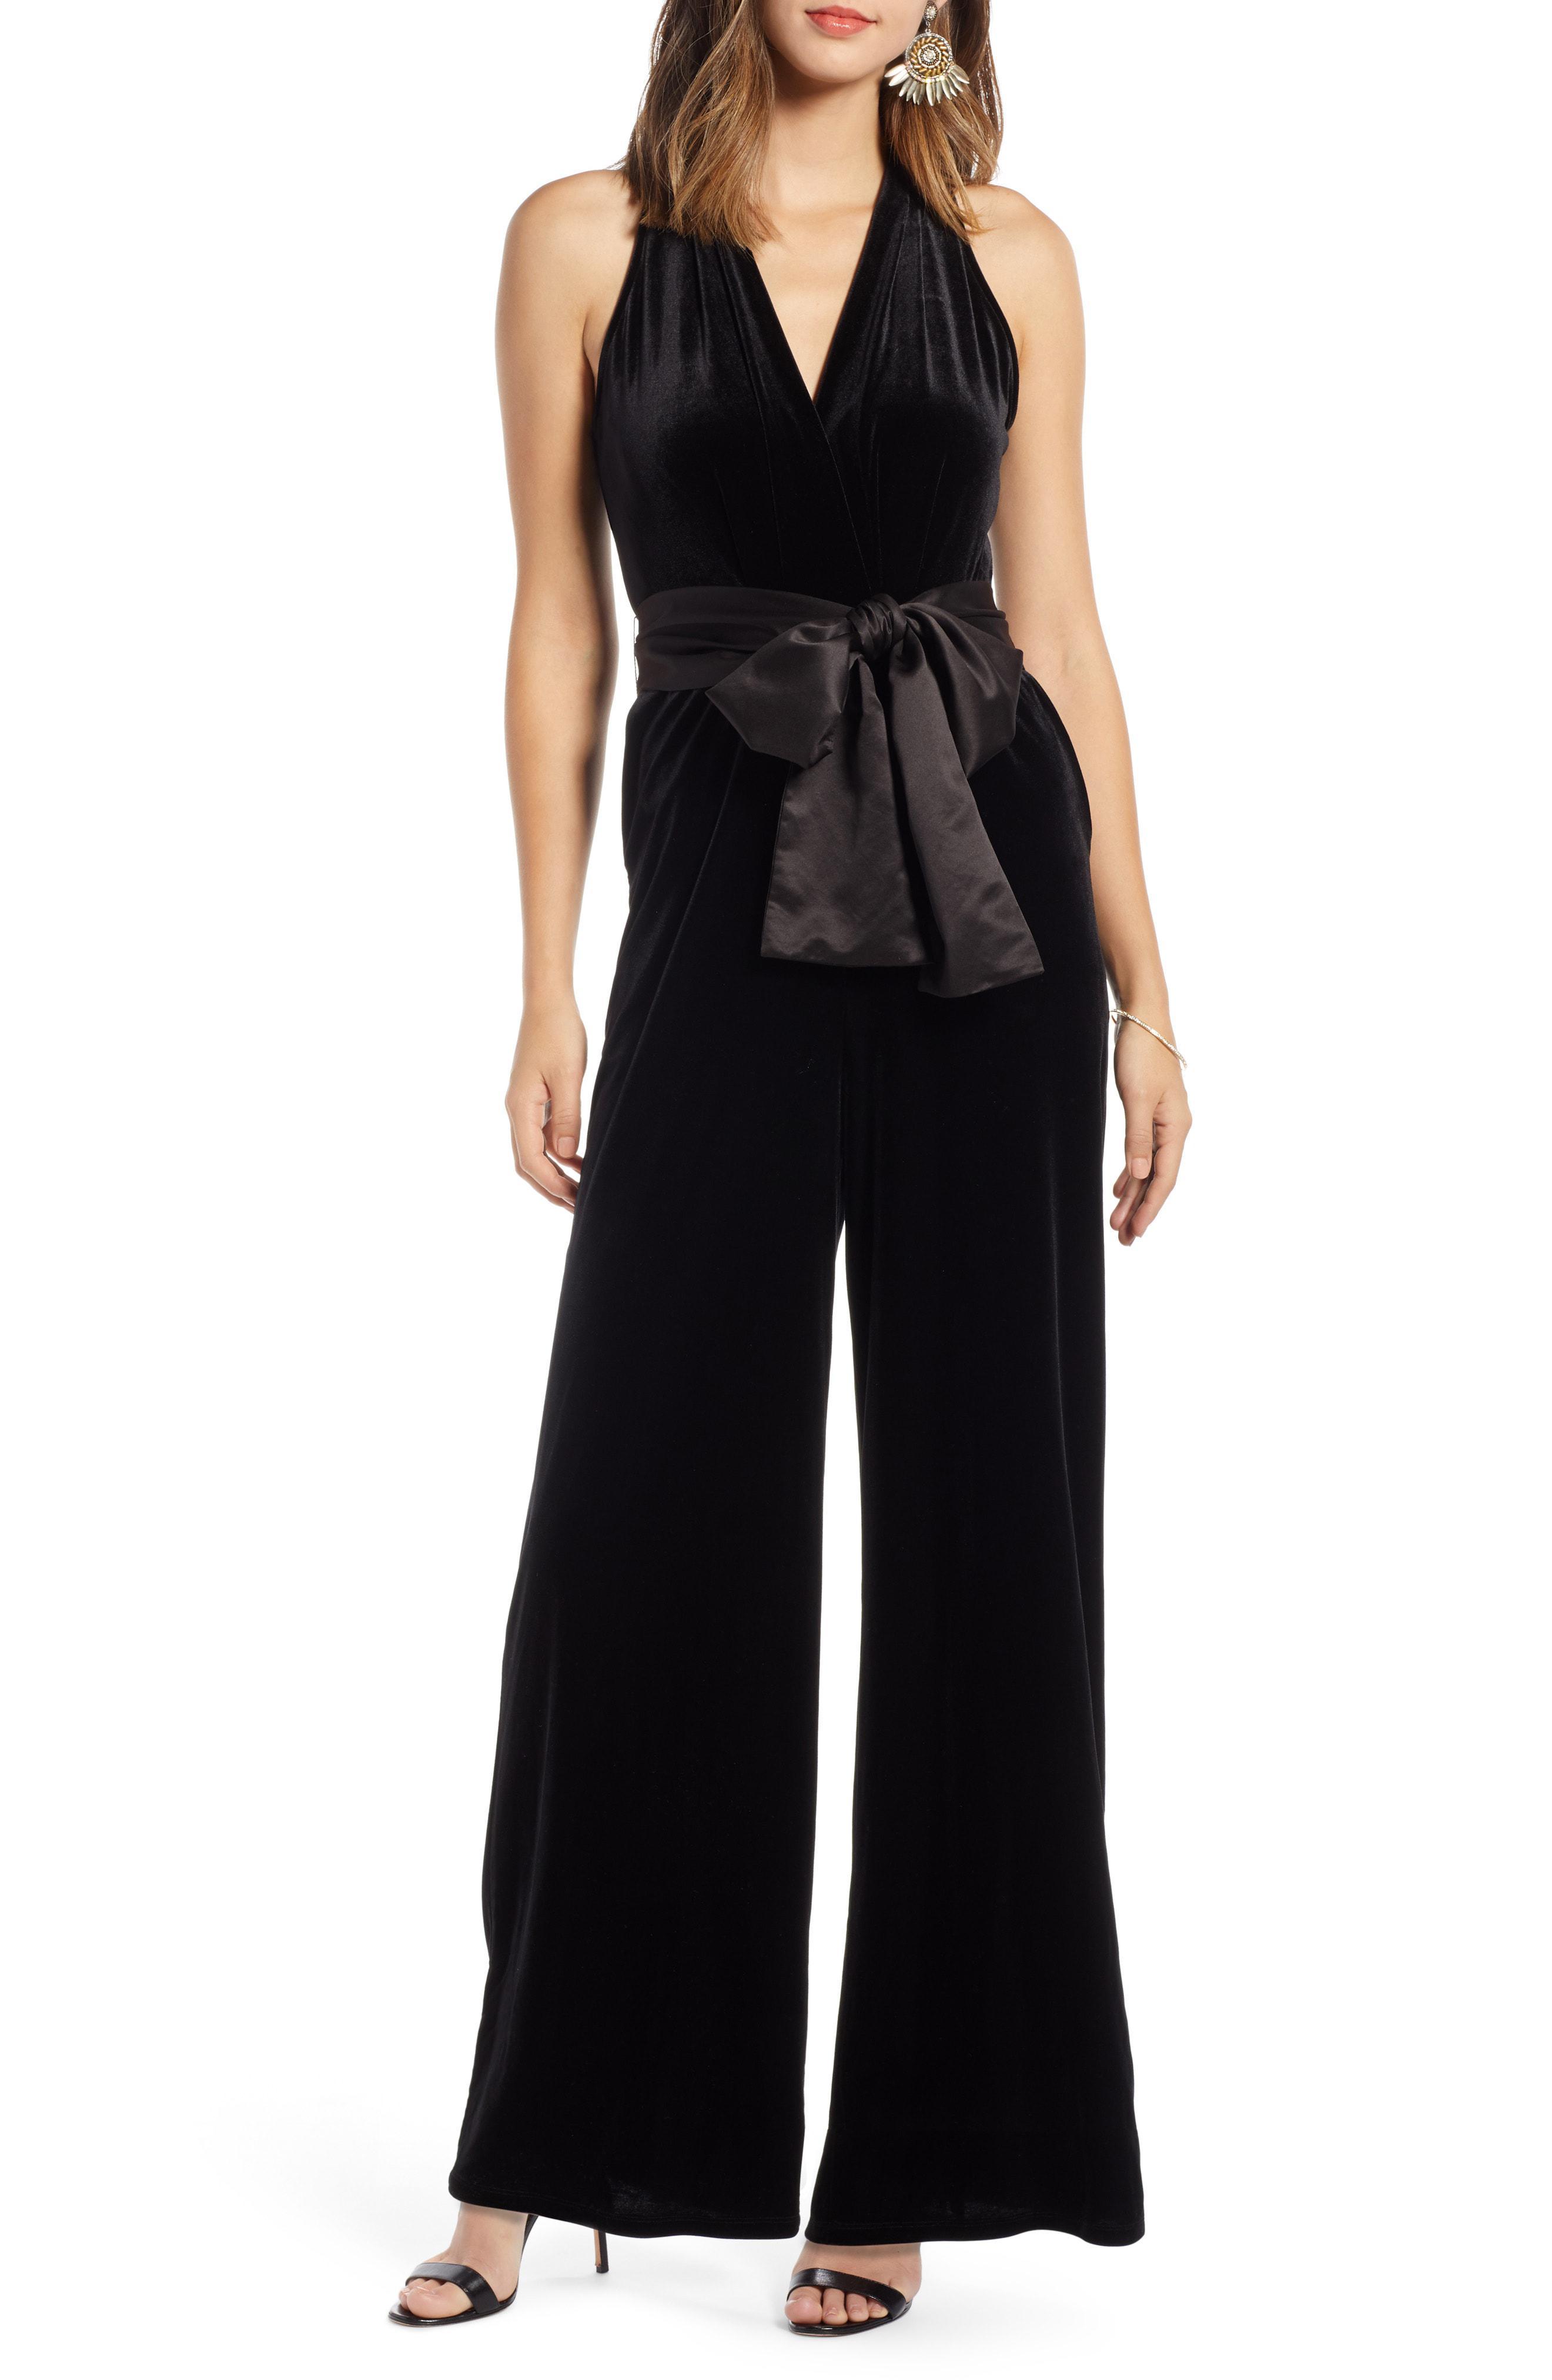 cf7699ee155 Lyst - Nordstrom 1901 Velvet Jumpsuit in Black